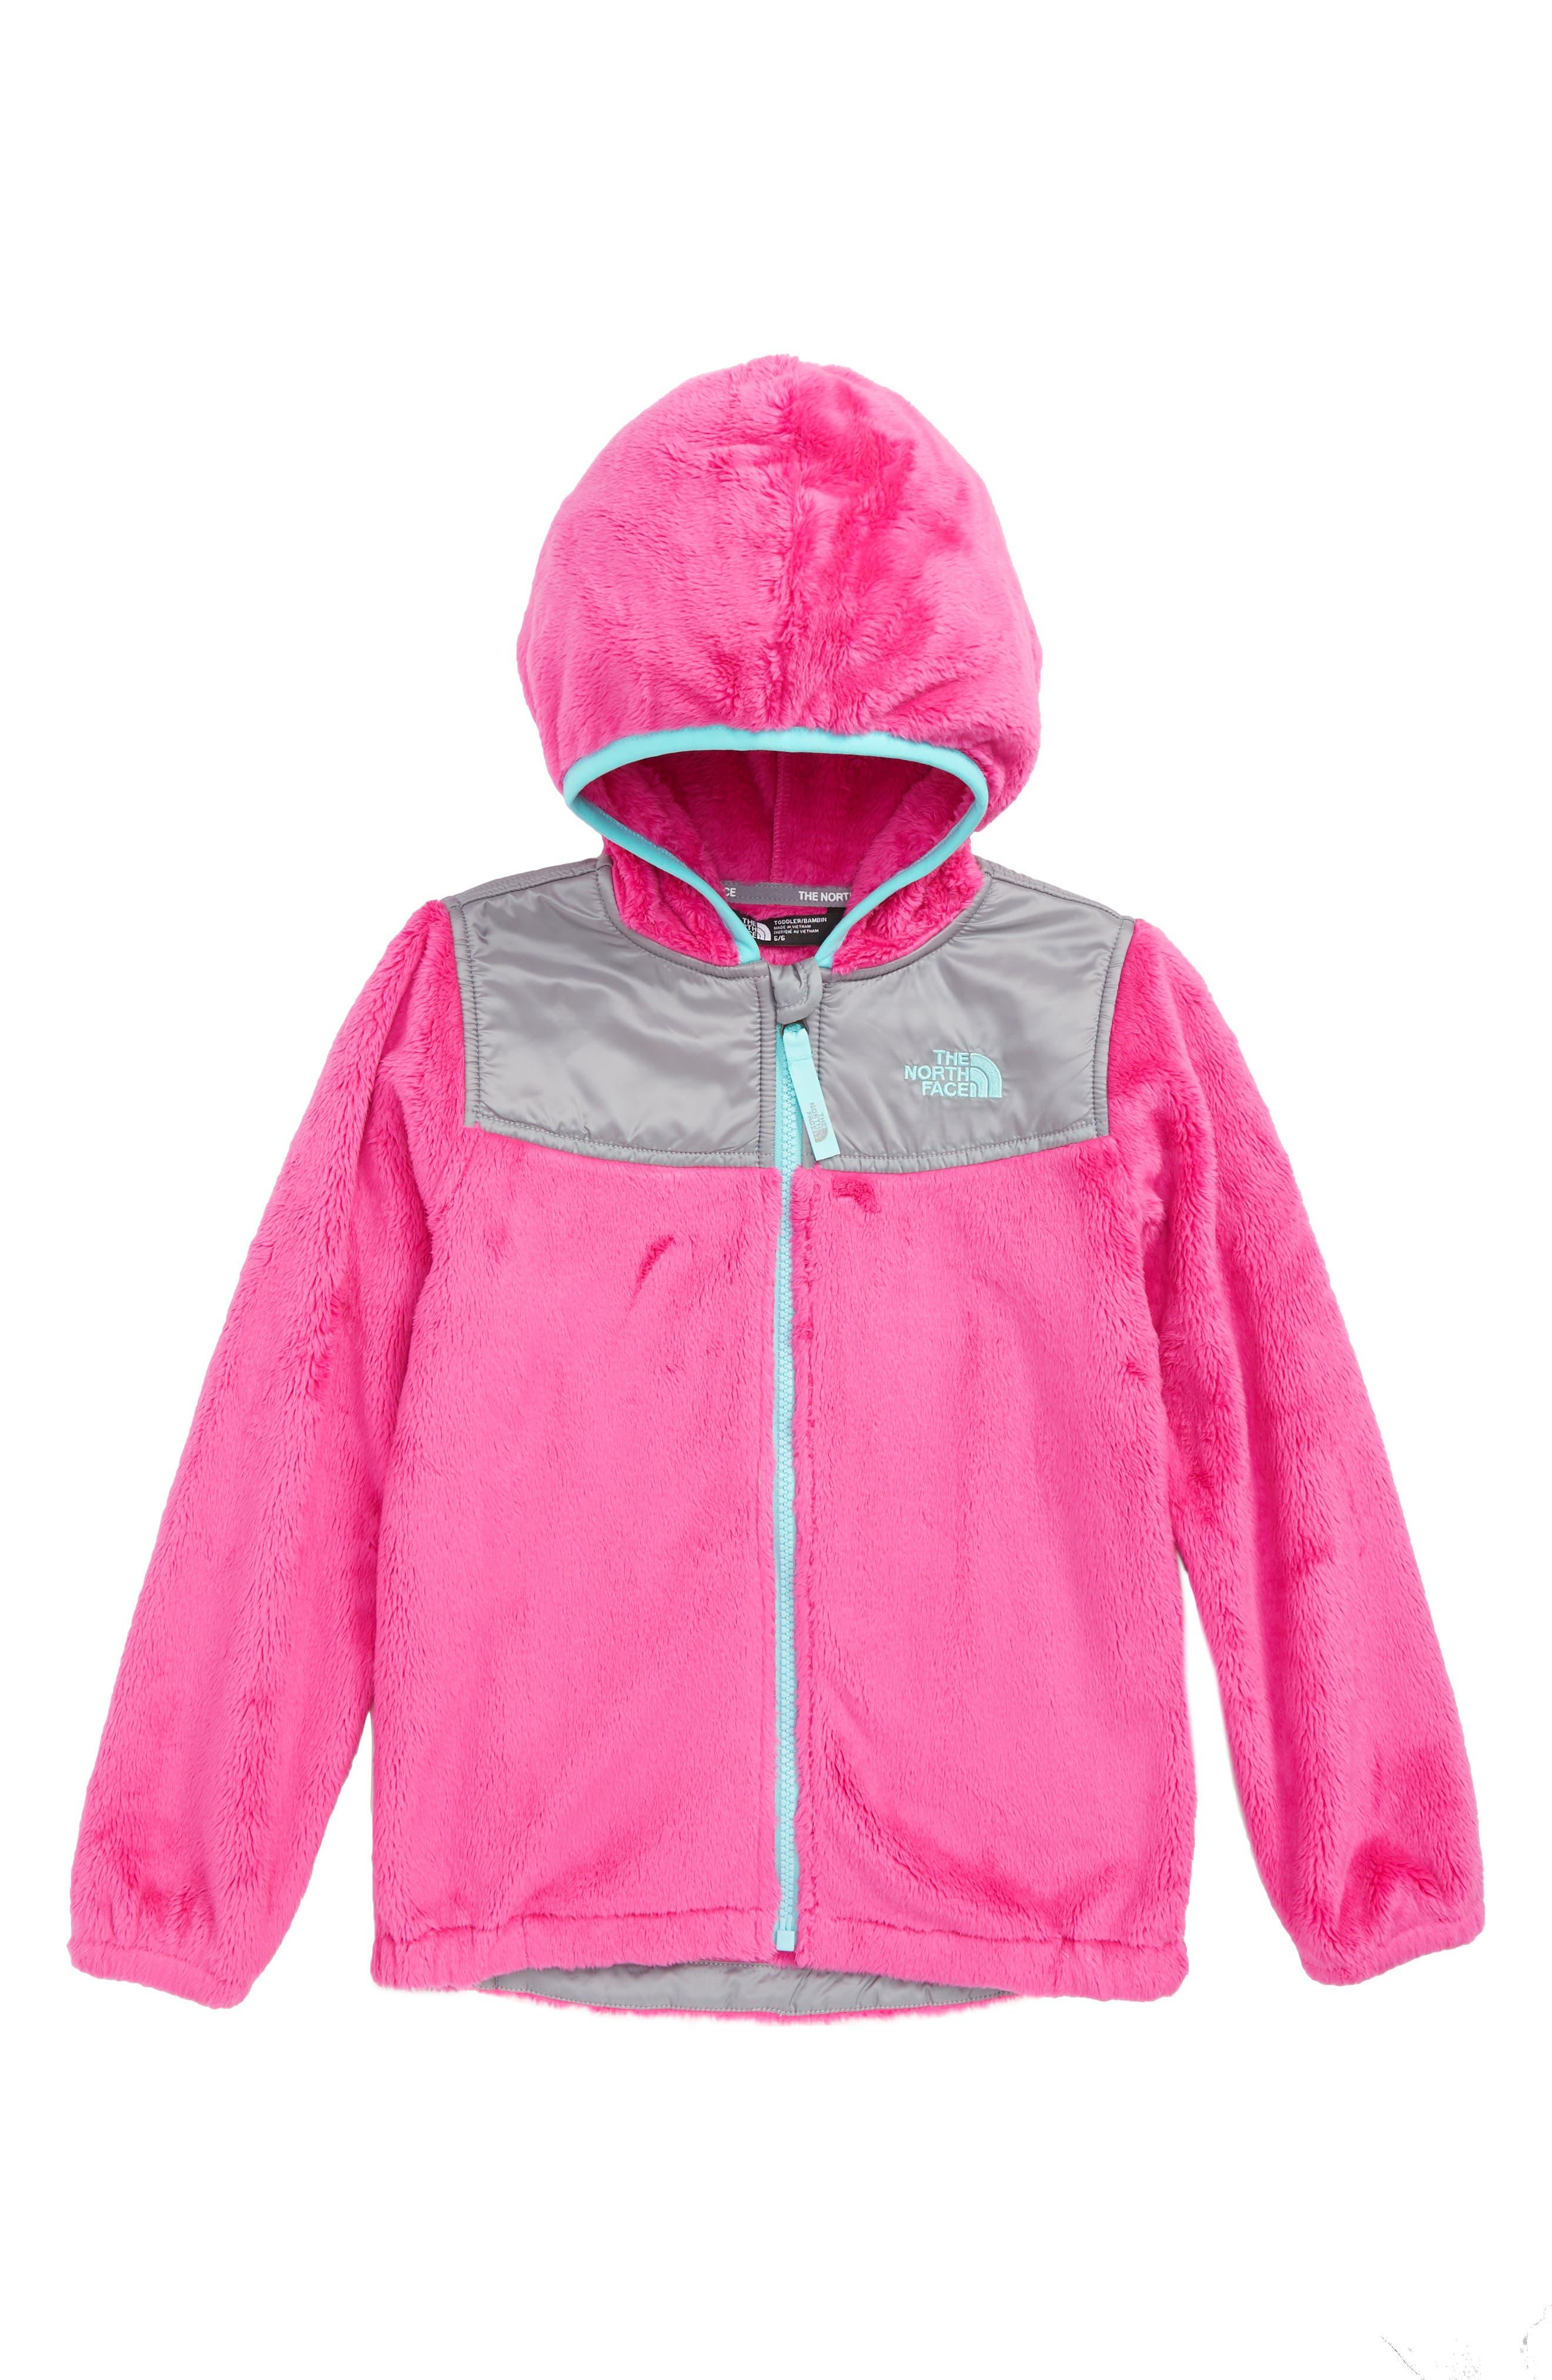 OSO Fleece Full-Zip Hoodie,                             Main thumbnail 1, color,                             AZALEA PINK